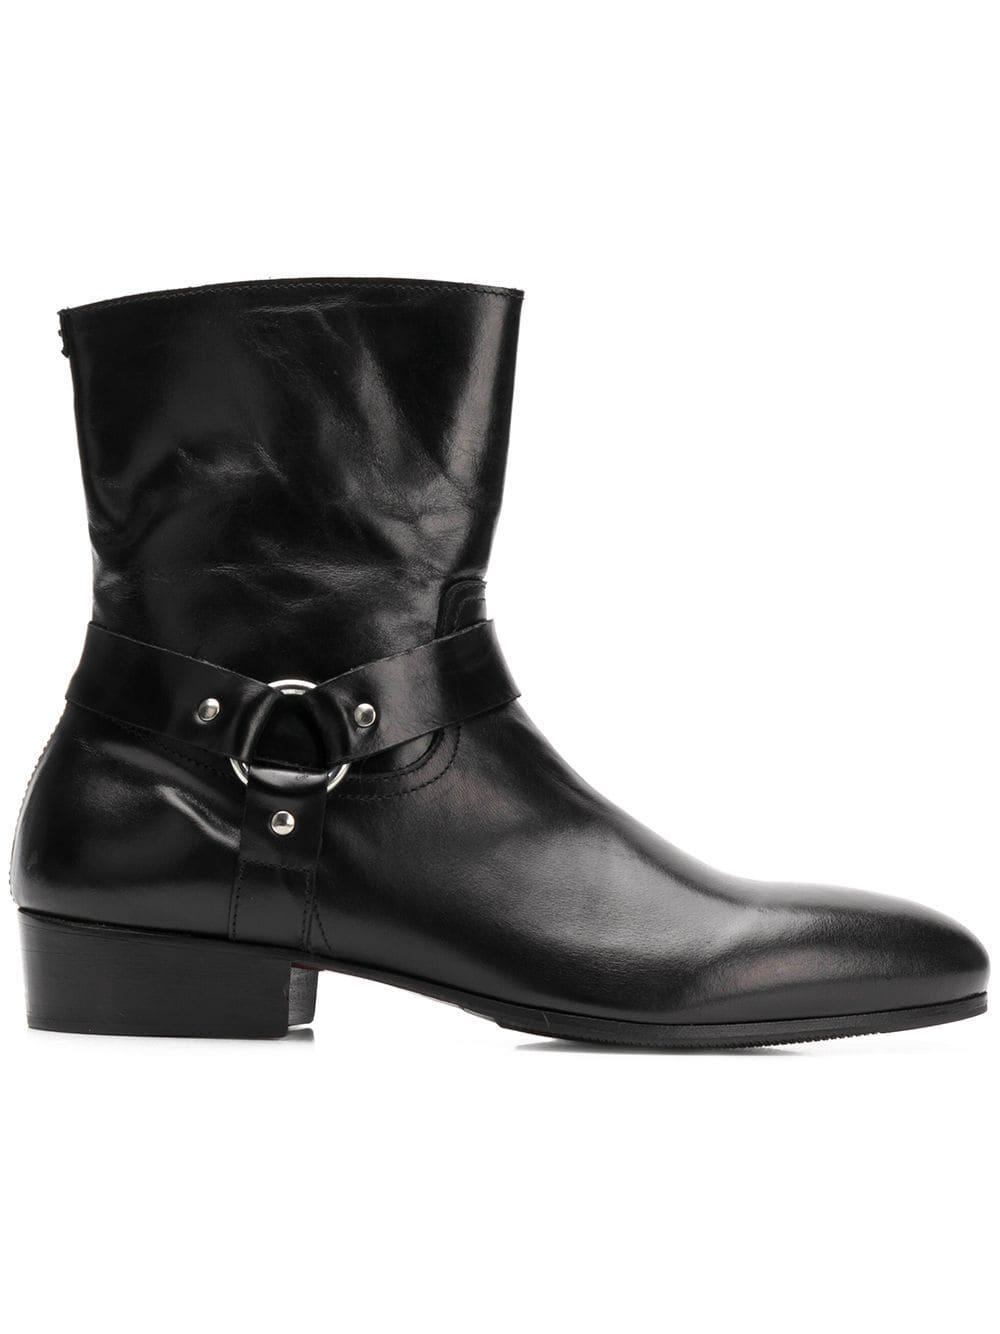 76be5a16fbf8c Leqarant low heel boots - Black - Glami.sk